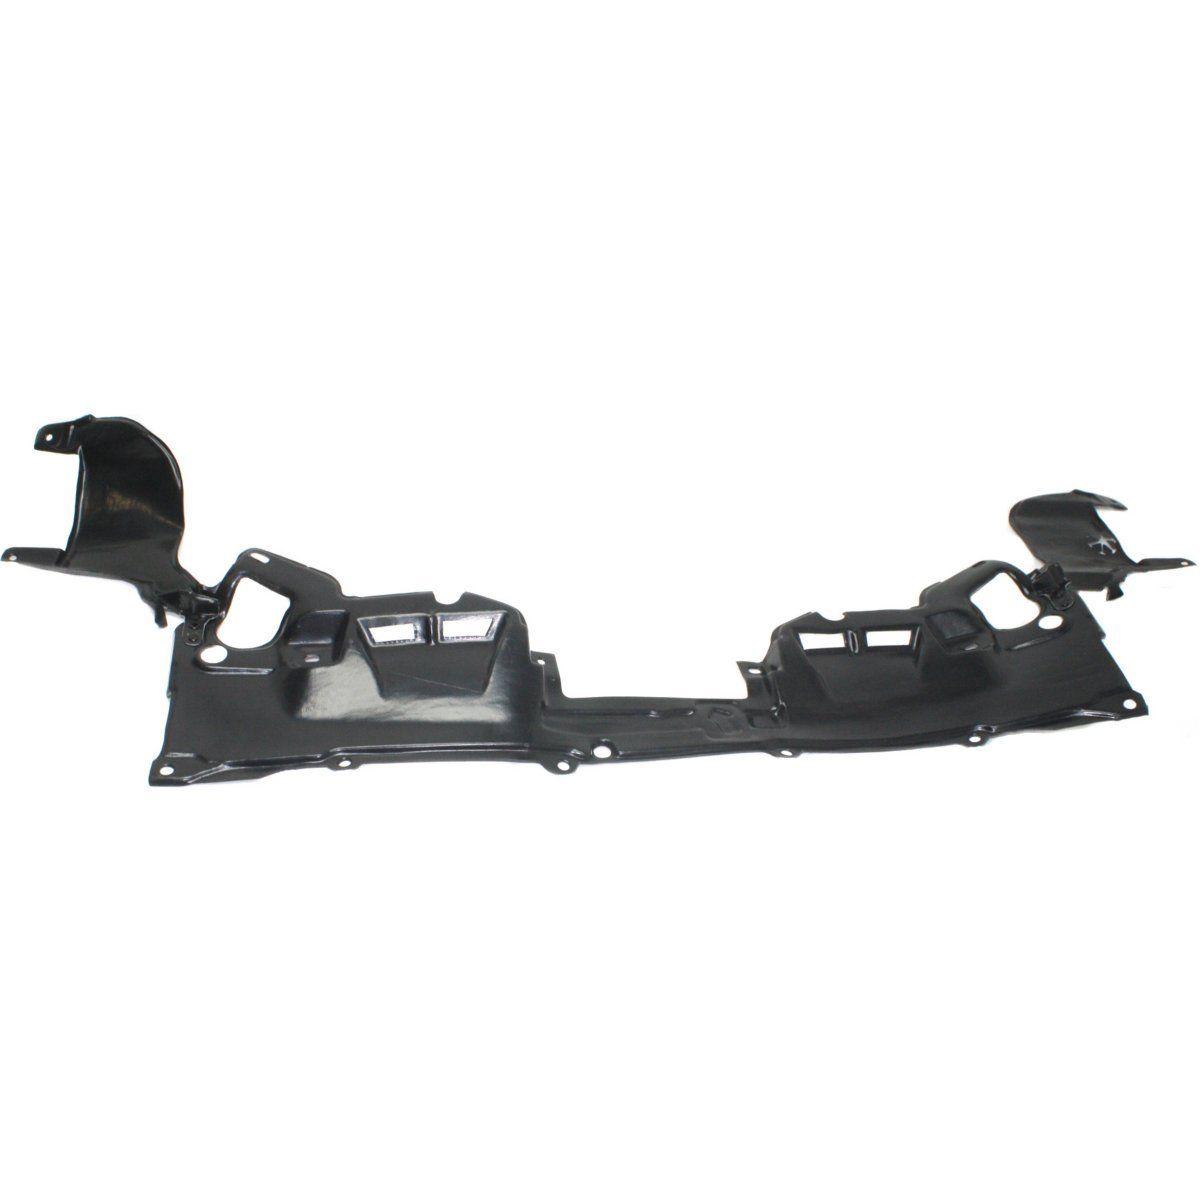 Front Engine Splash Shield For 2012-2015 Honda Civic 2013